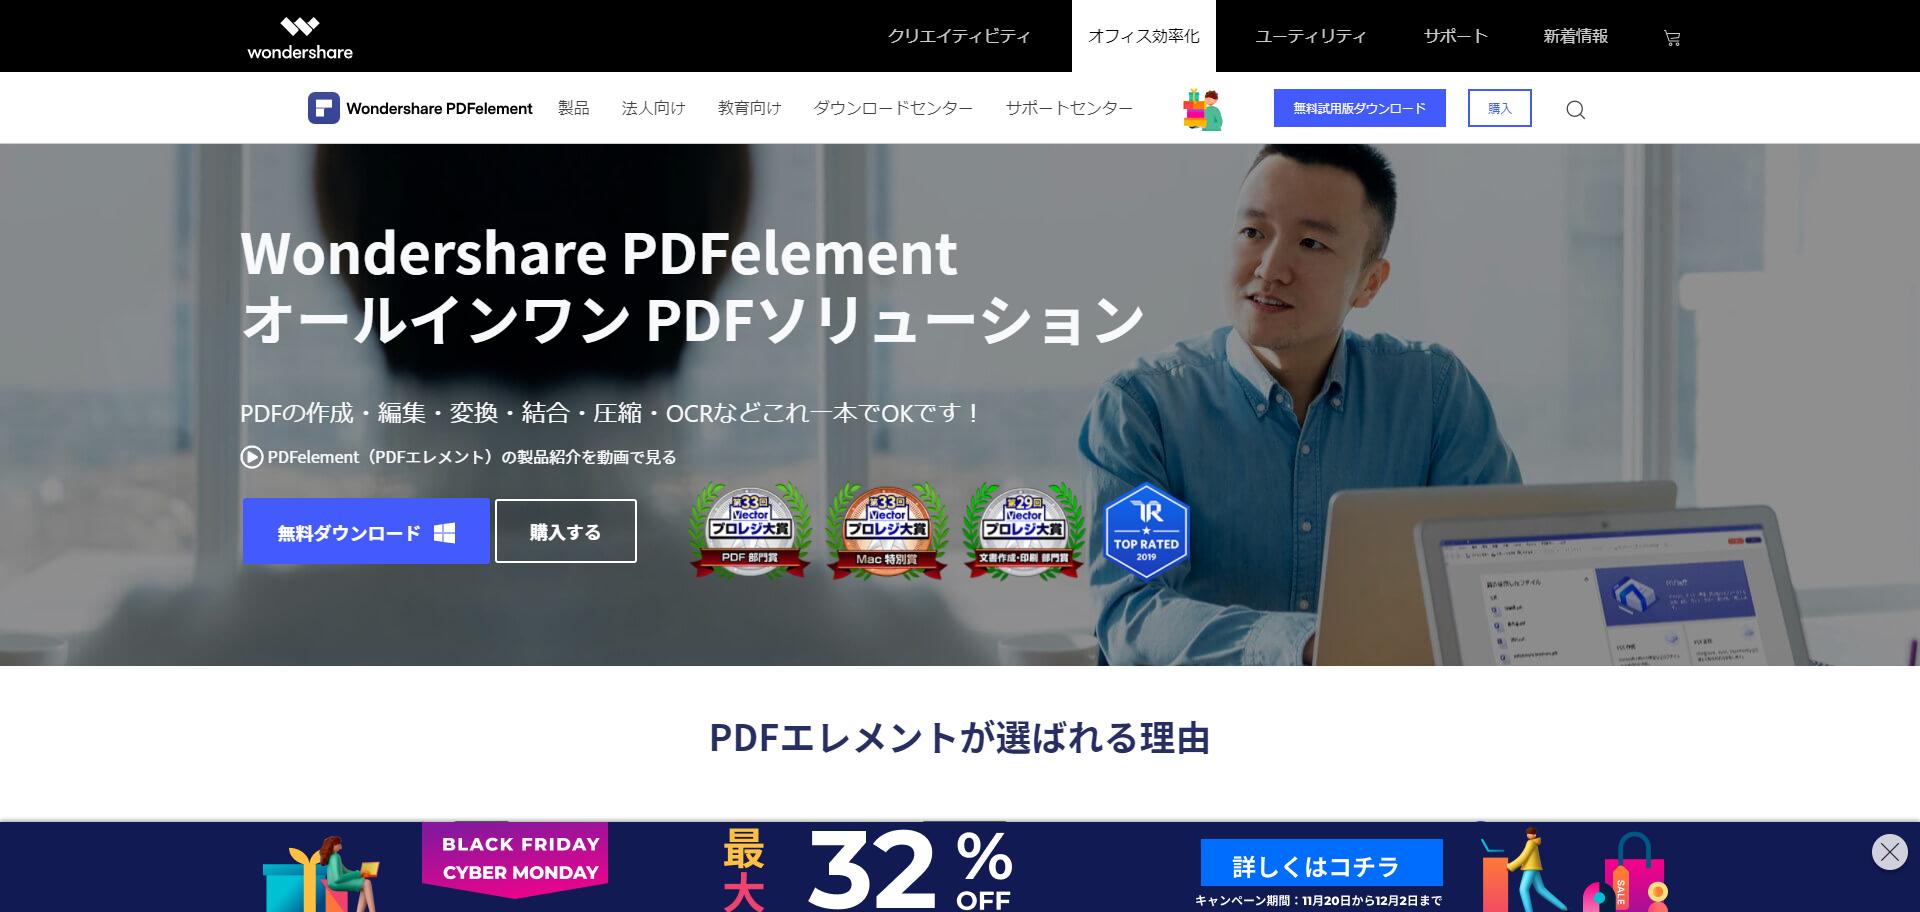 PDFelementを使うトリミングの方法